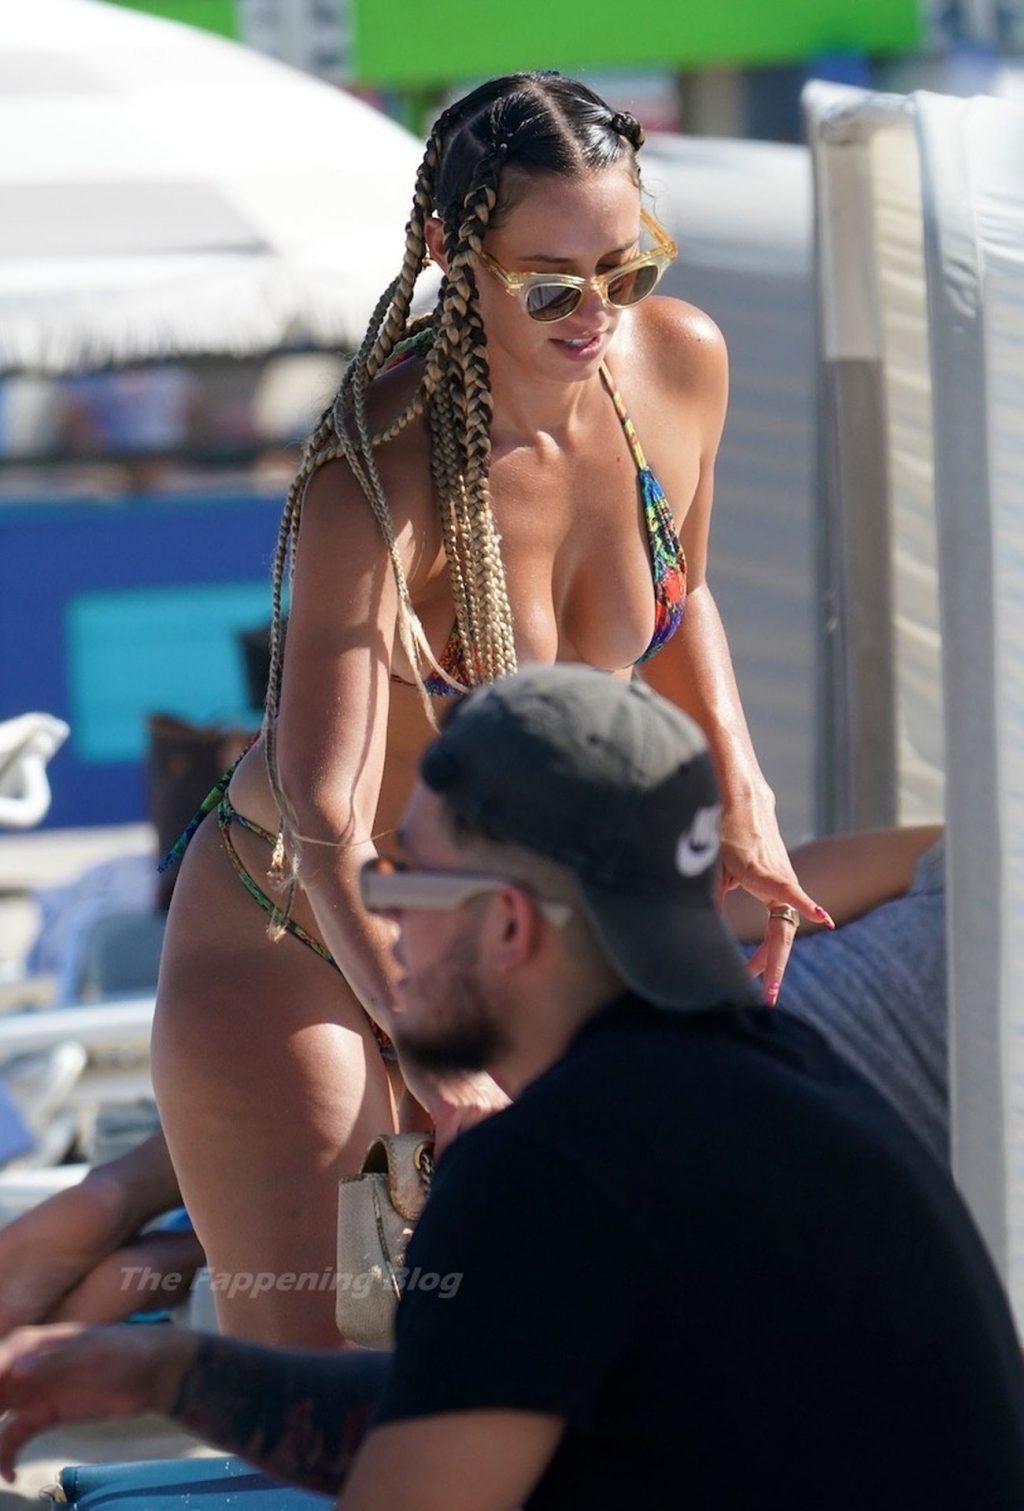 YesJulz is Seen in a Thong Bikini at the Beach in Miami (12 Photos)